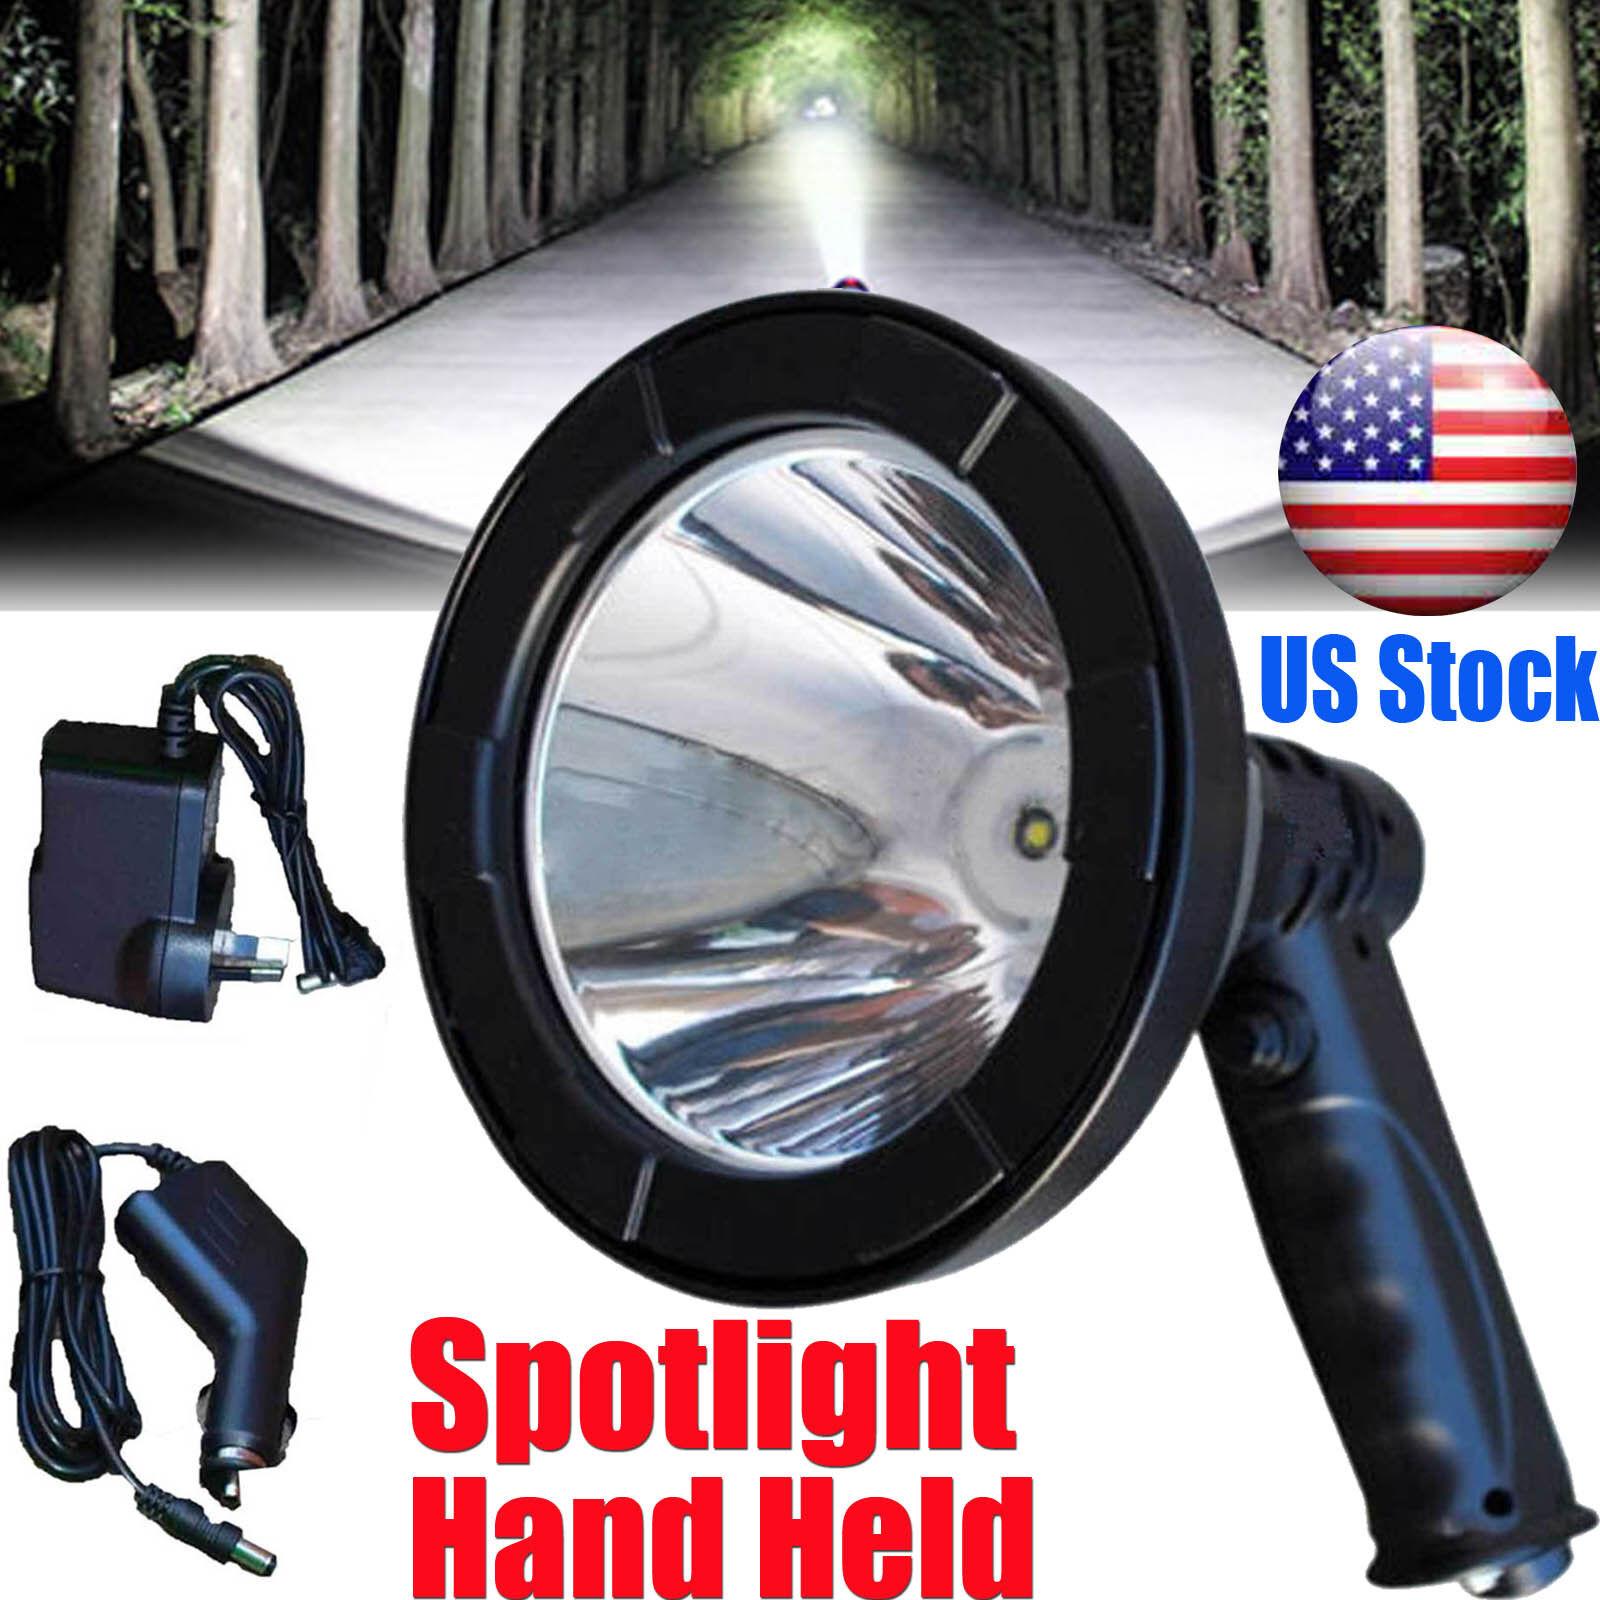 980W LED Handheld Spot light Lamp Camping Hunting Fishing Hiking Rechargable 12V